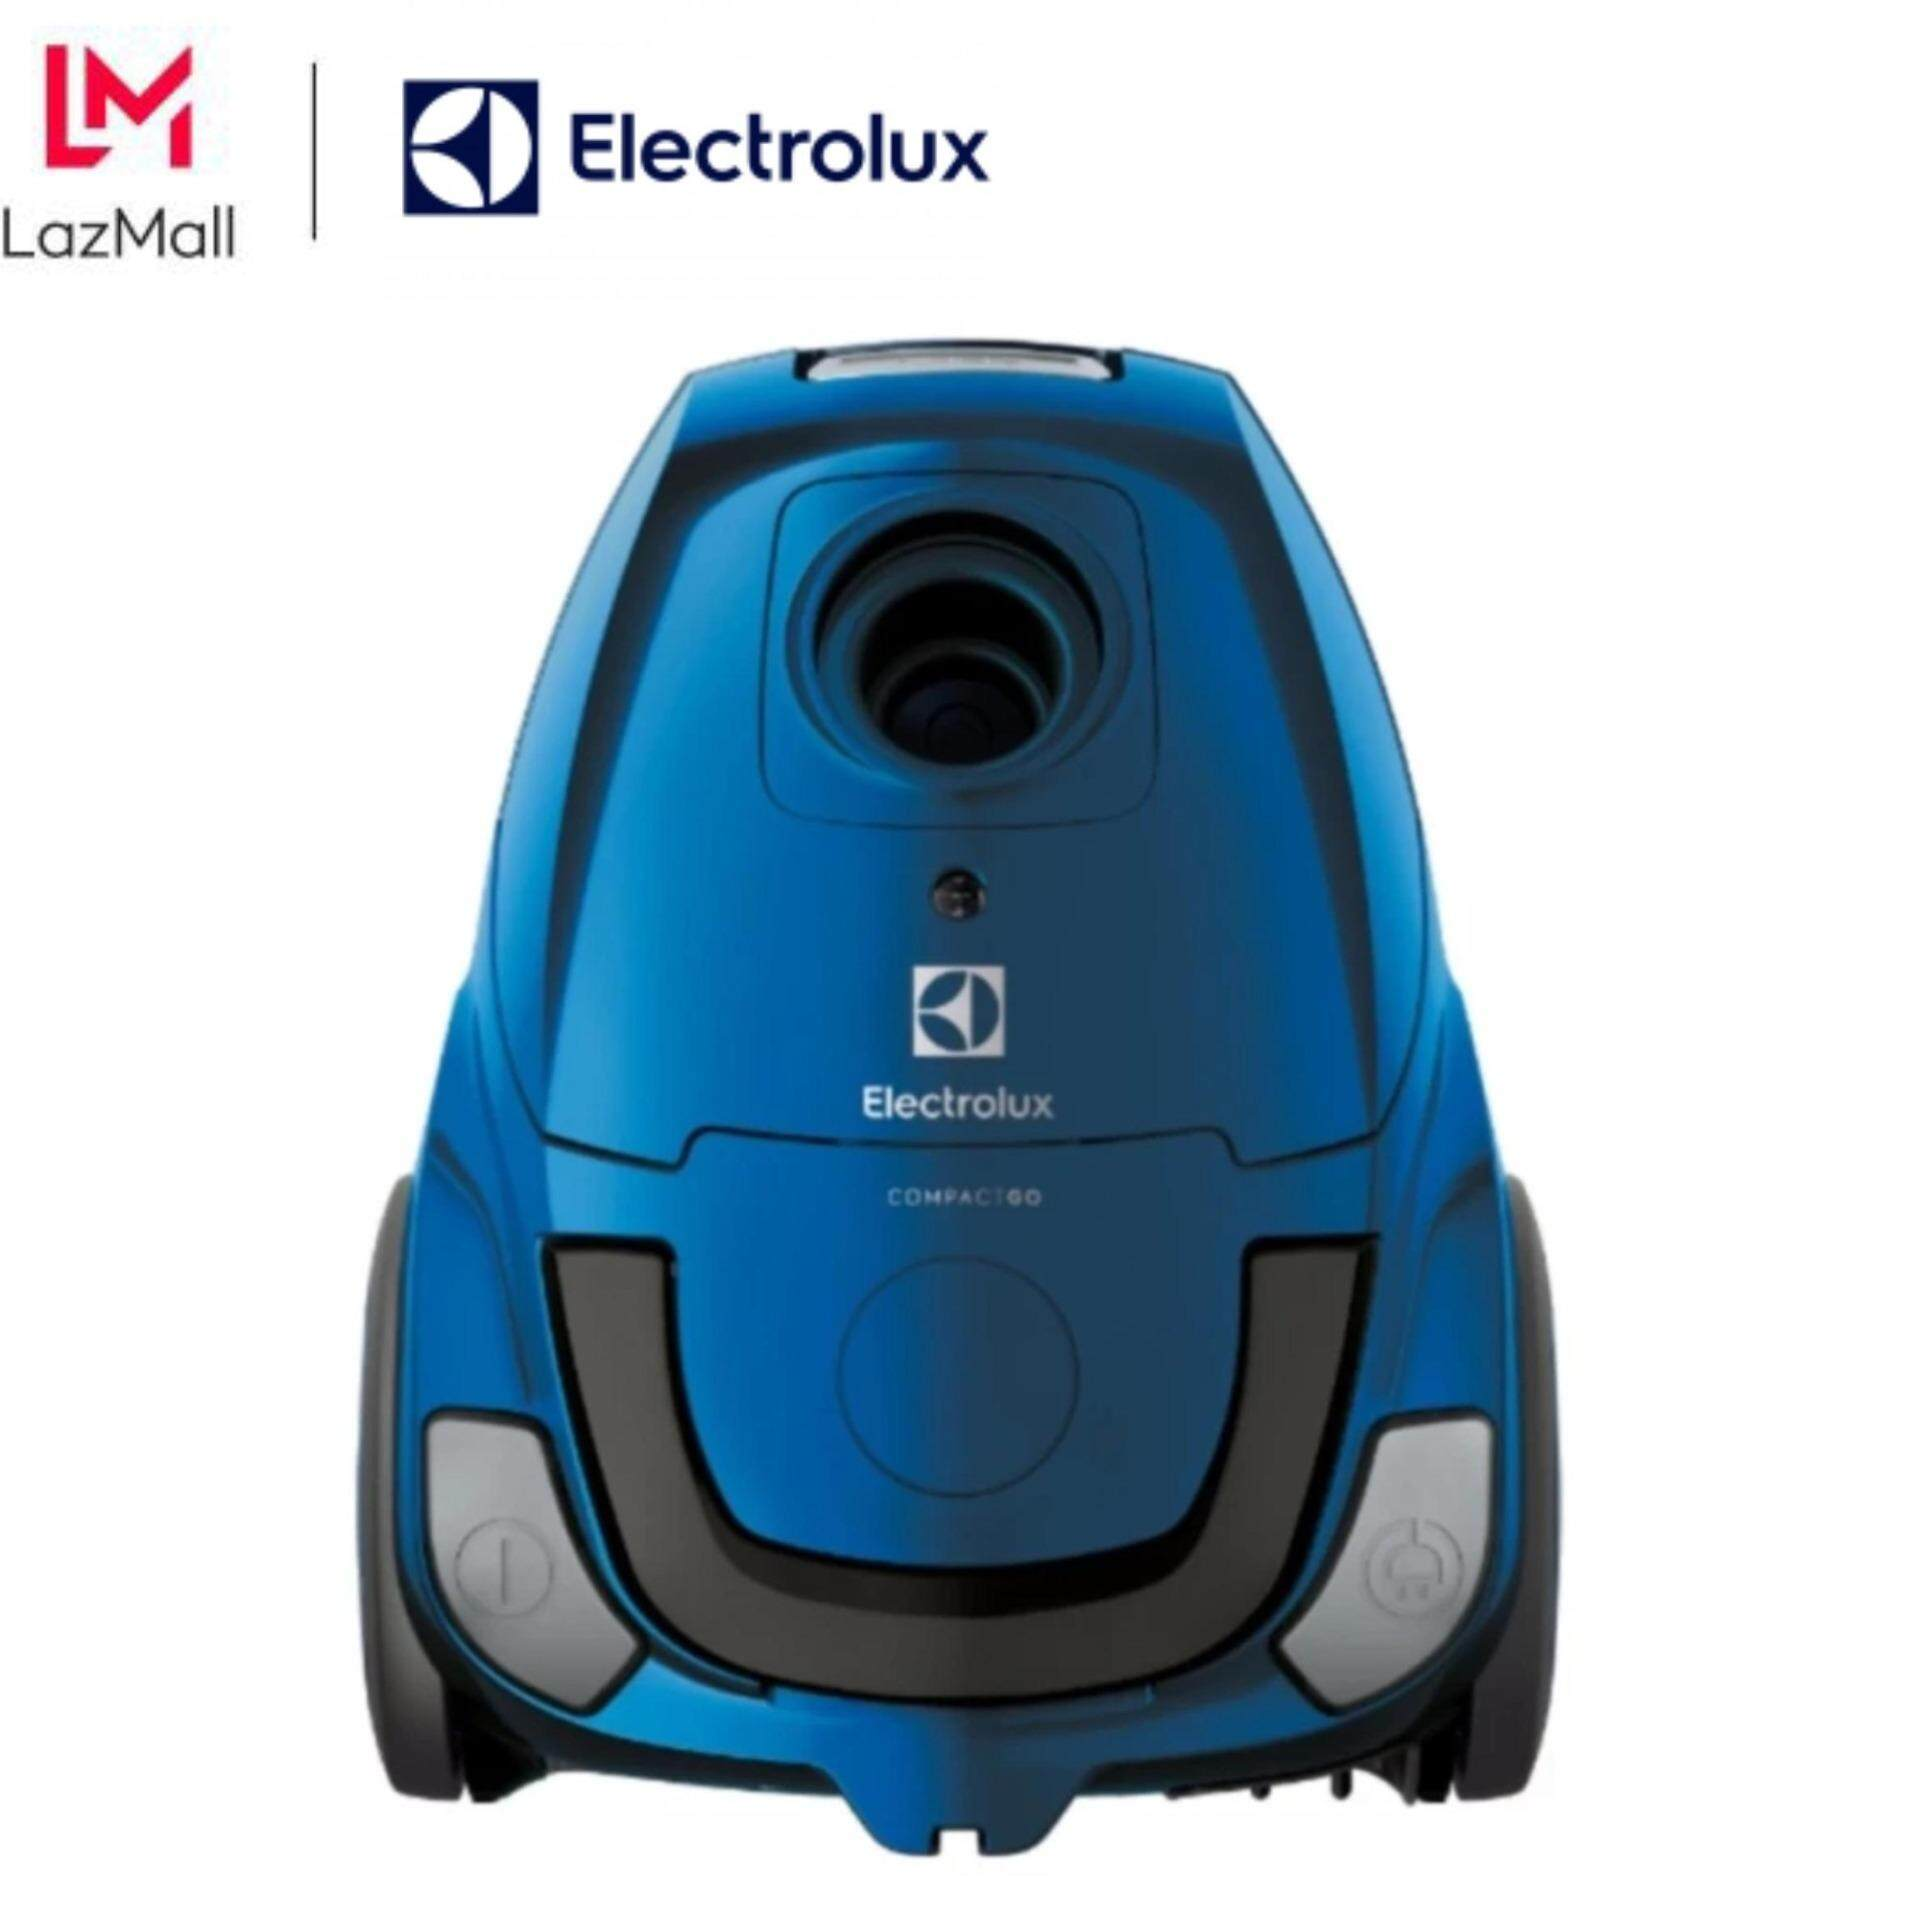 Electrolux Vacuum Cleaner Z1220 1L (LATEST MODEL), 1600W